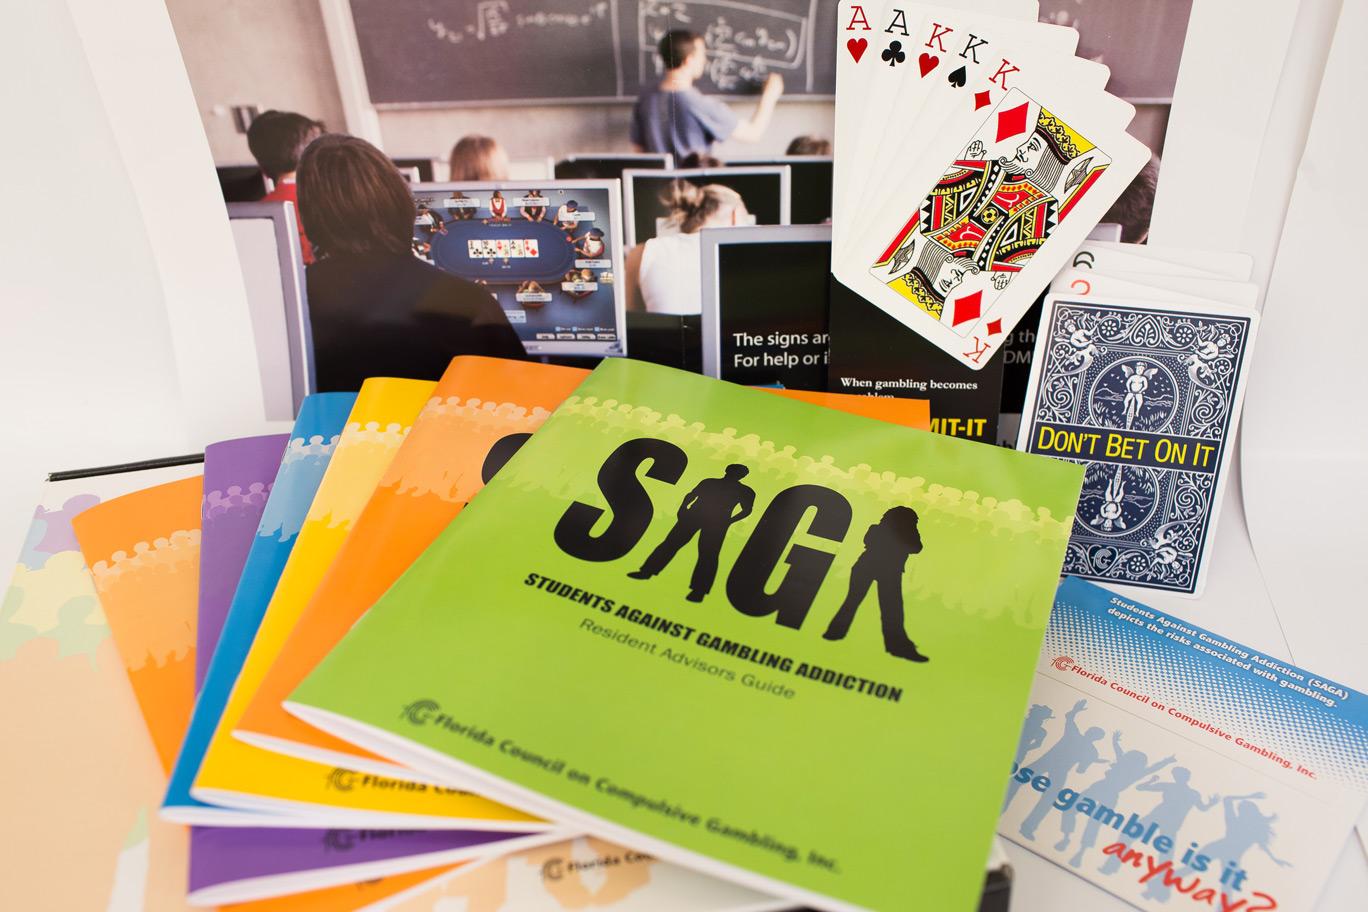 Students Advocating for Gambling Awareness (SAGA)